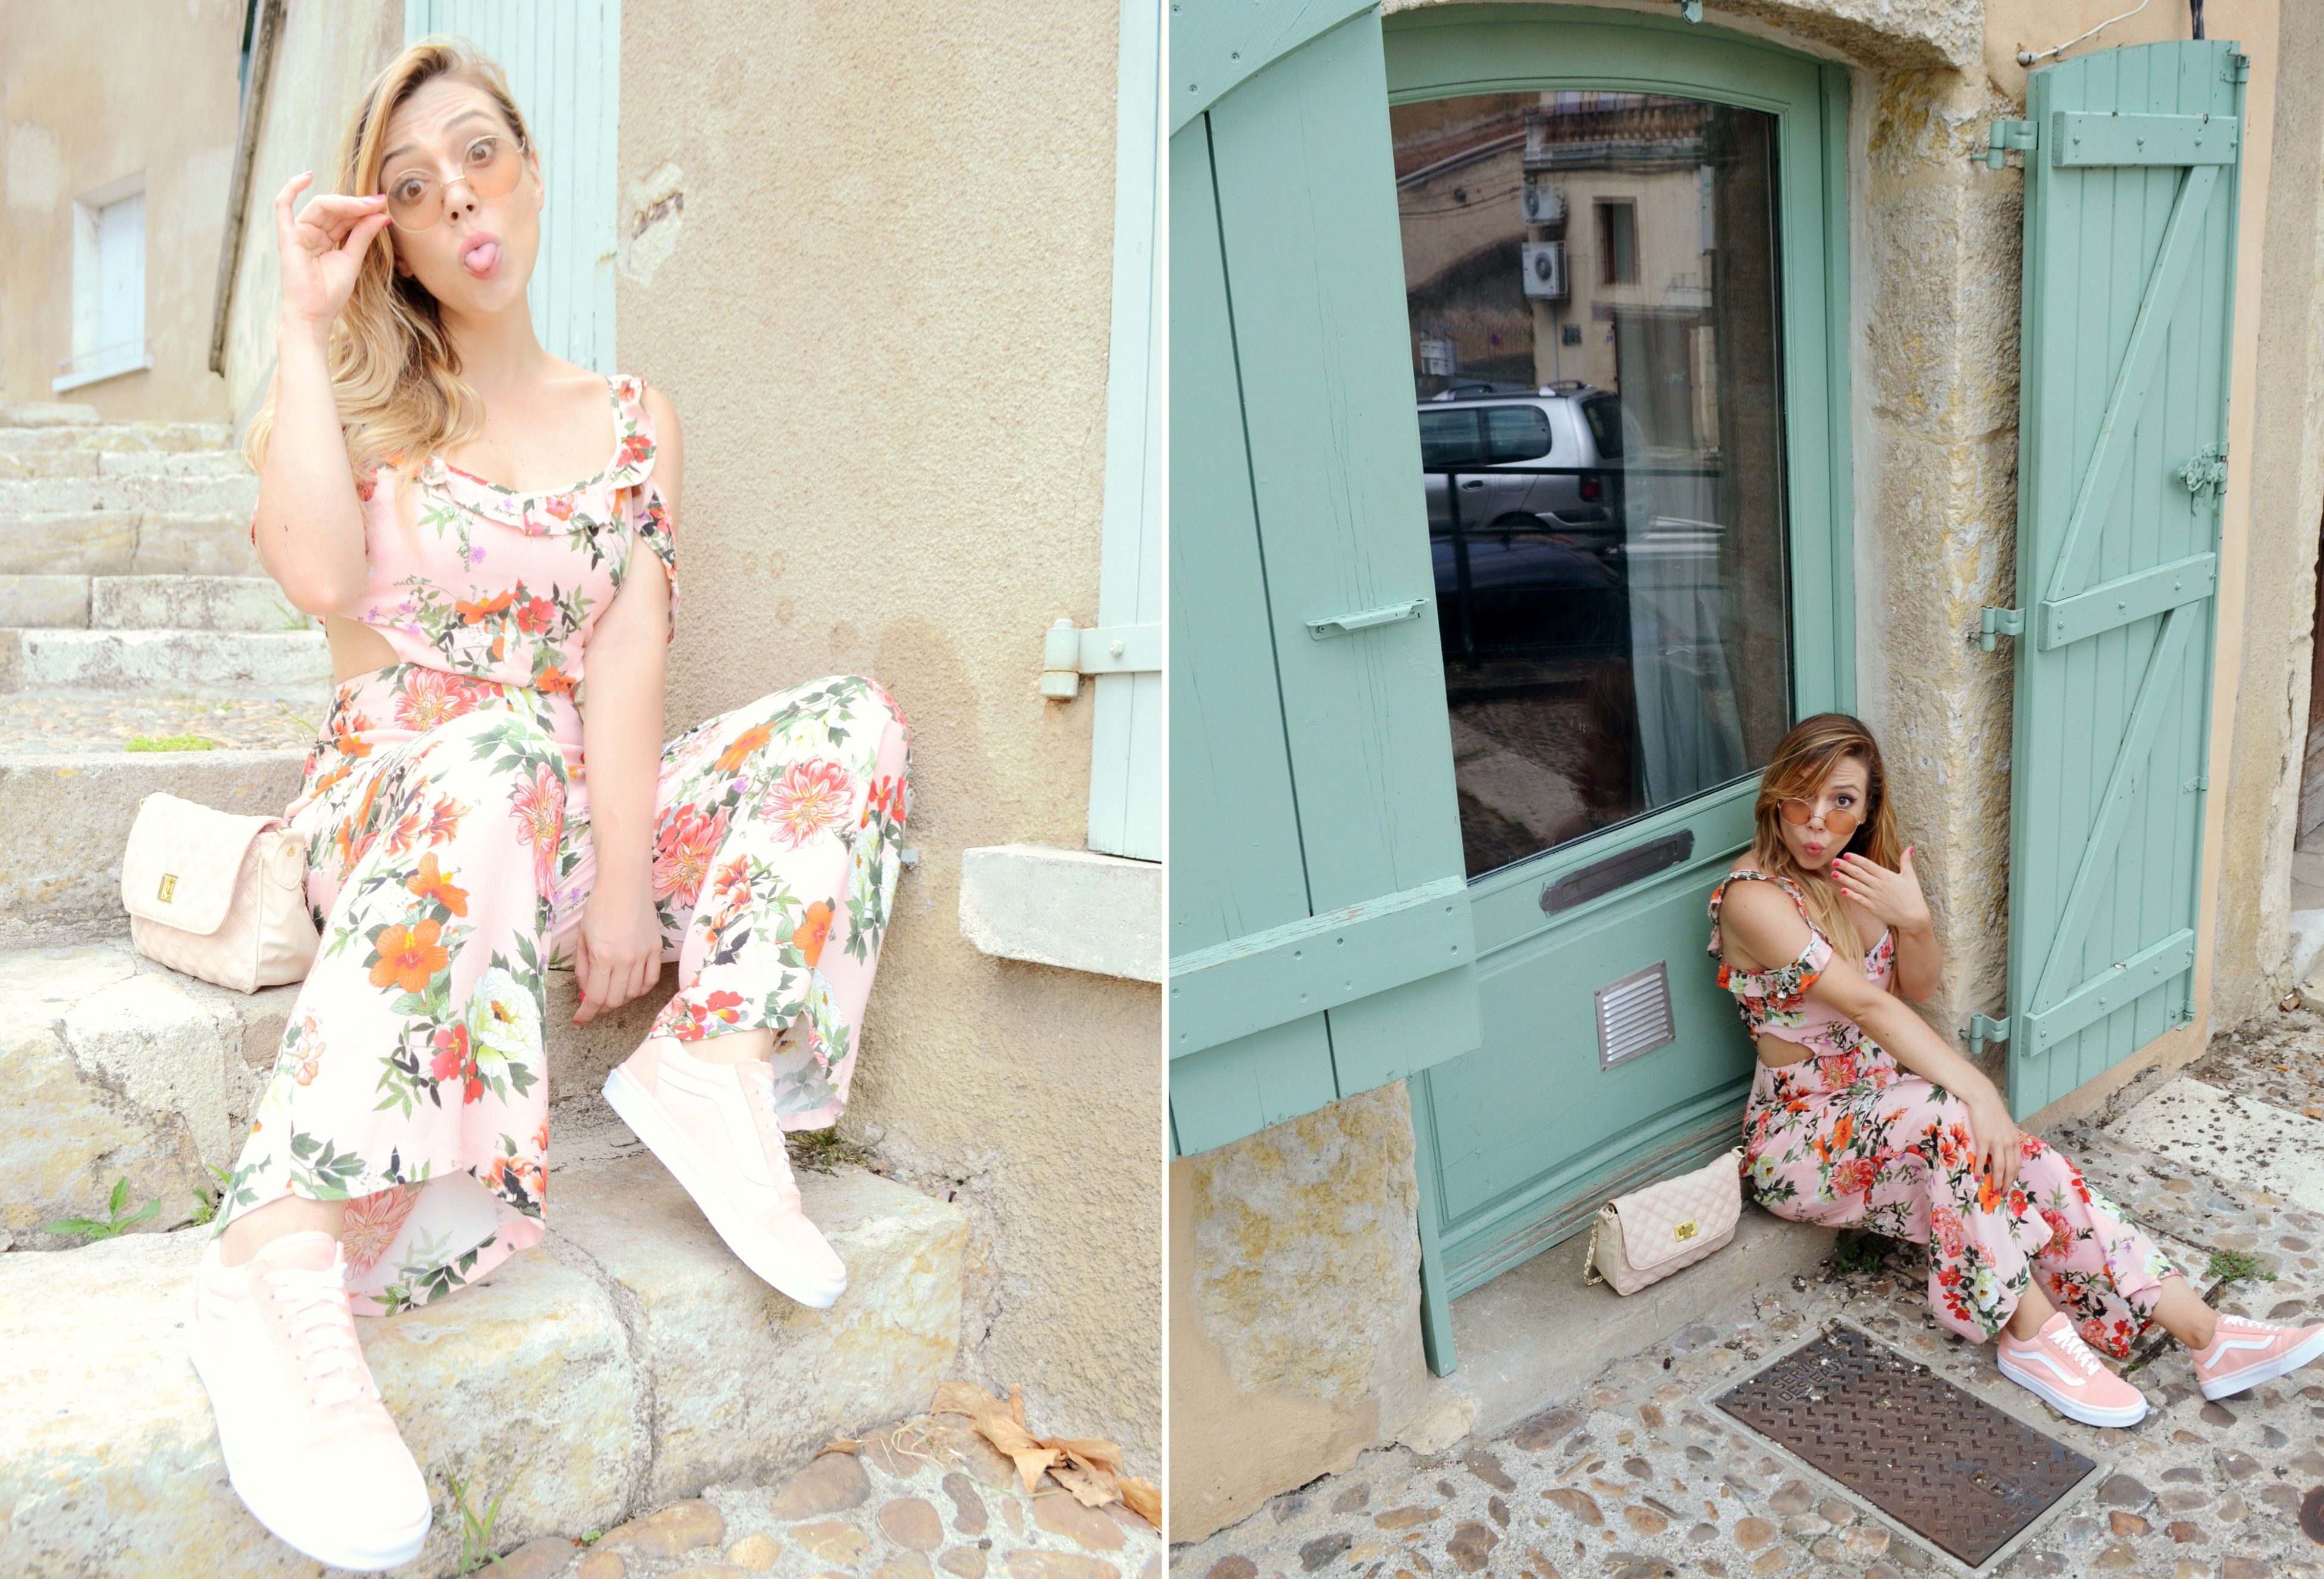 ChicAdicta-blog-de-moda-ChicAdicta-fashionista-mono-de-flores-influencer-jdsports-Vans-pastel-flowers-outfit-PiensaenChic-Piensa-en-Chic